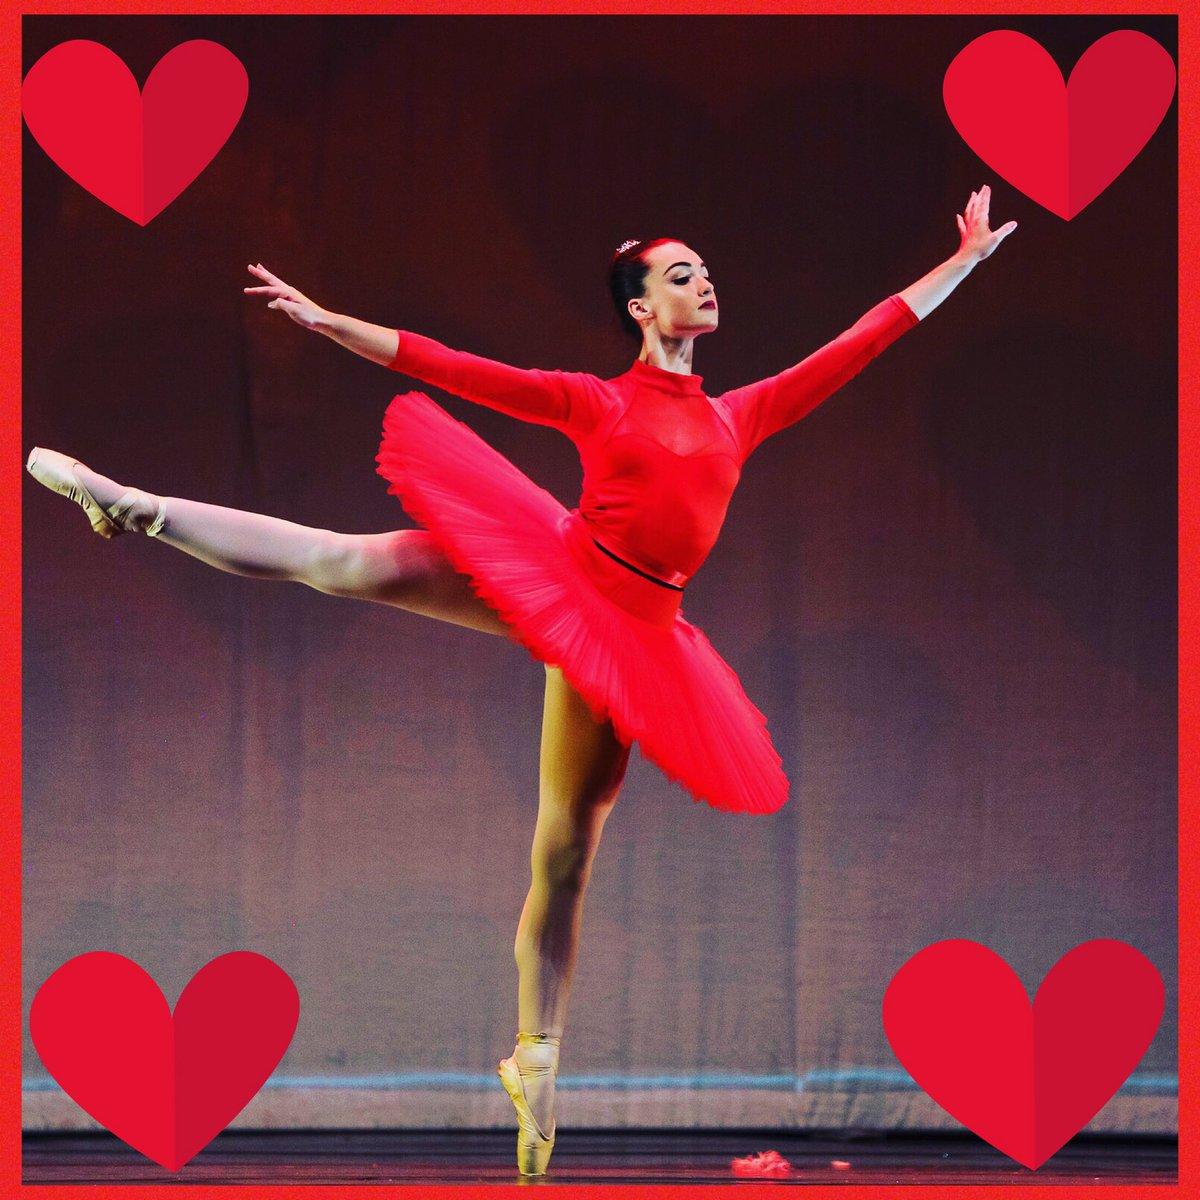 #valentinesday #love #ballet #dance #royalacademyofdance #goingsomewherepic.twitter.com/XUmWcvTc9V